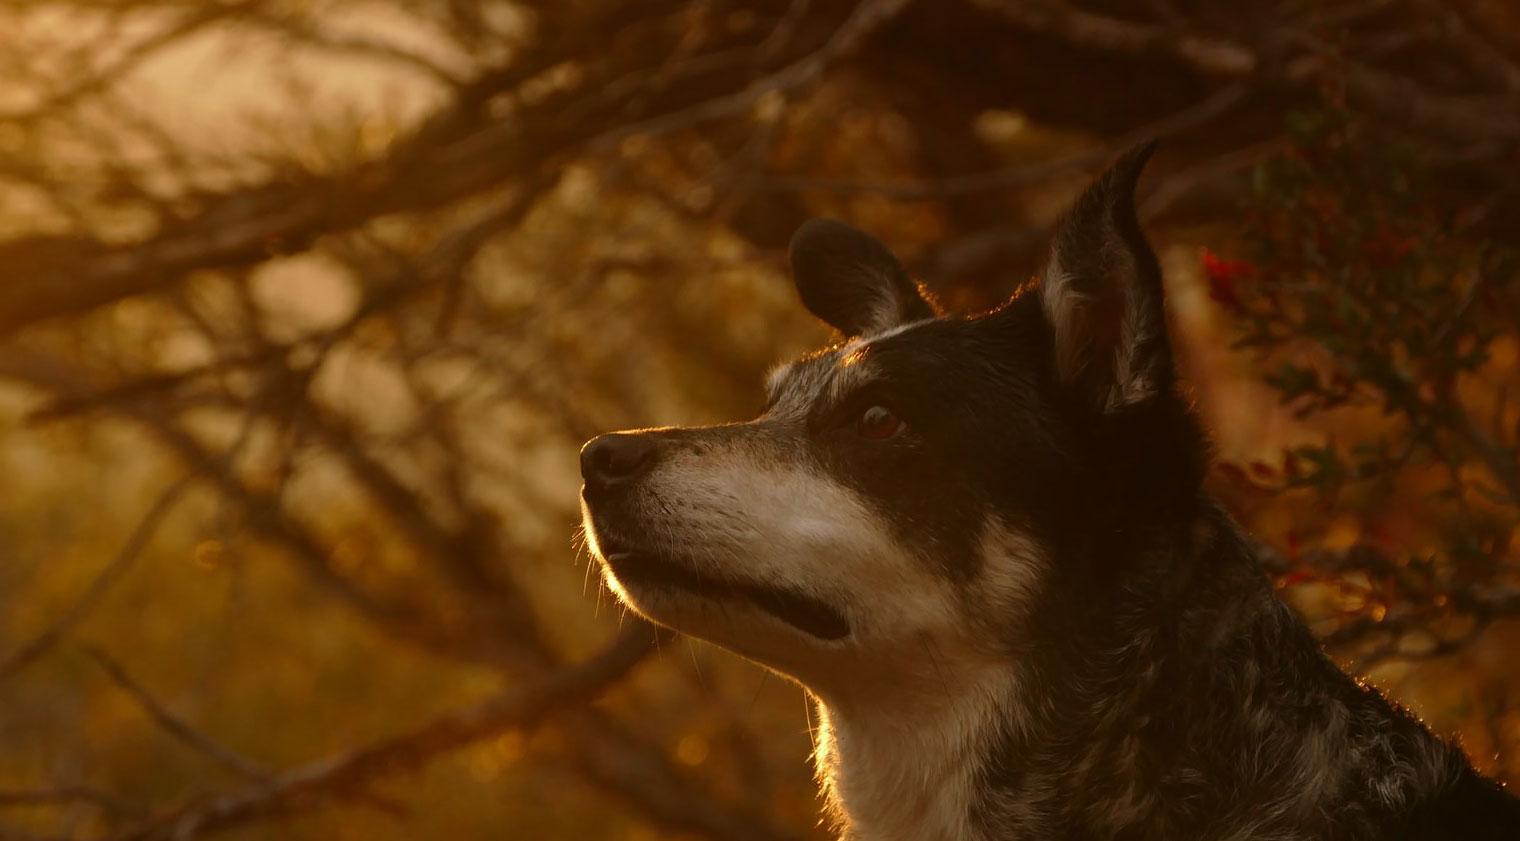 Dog gazing in haze